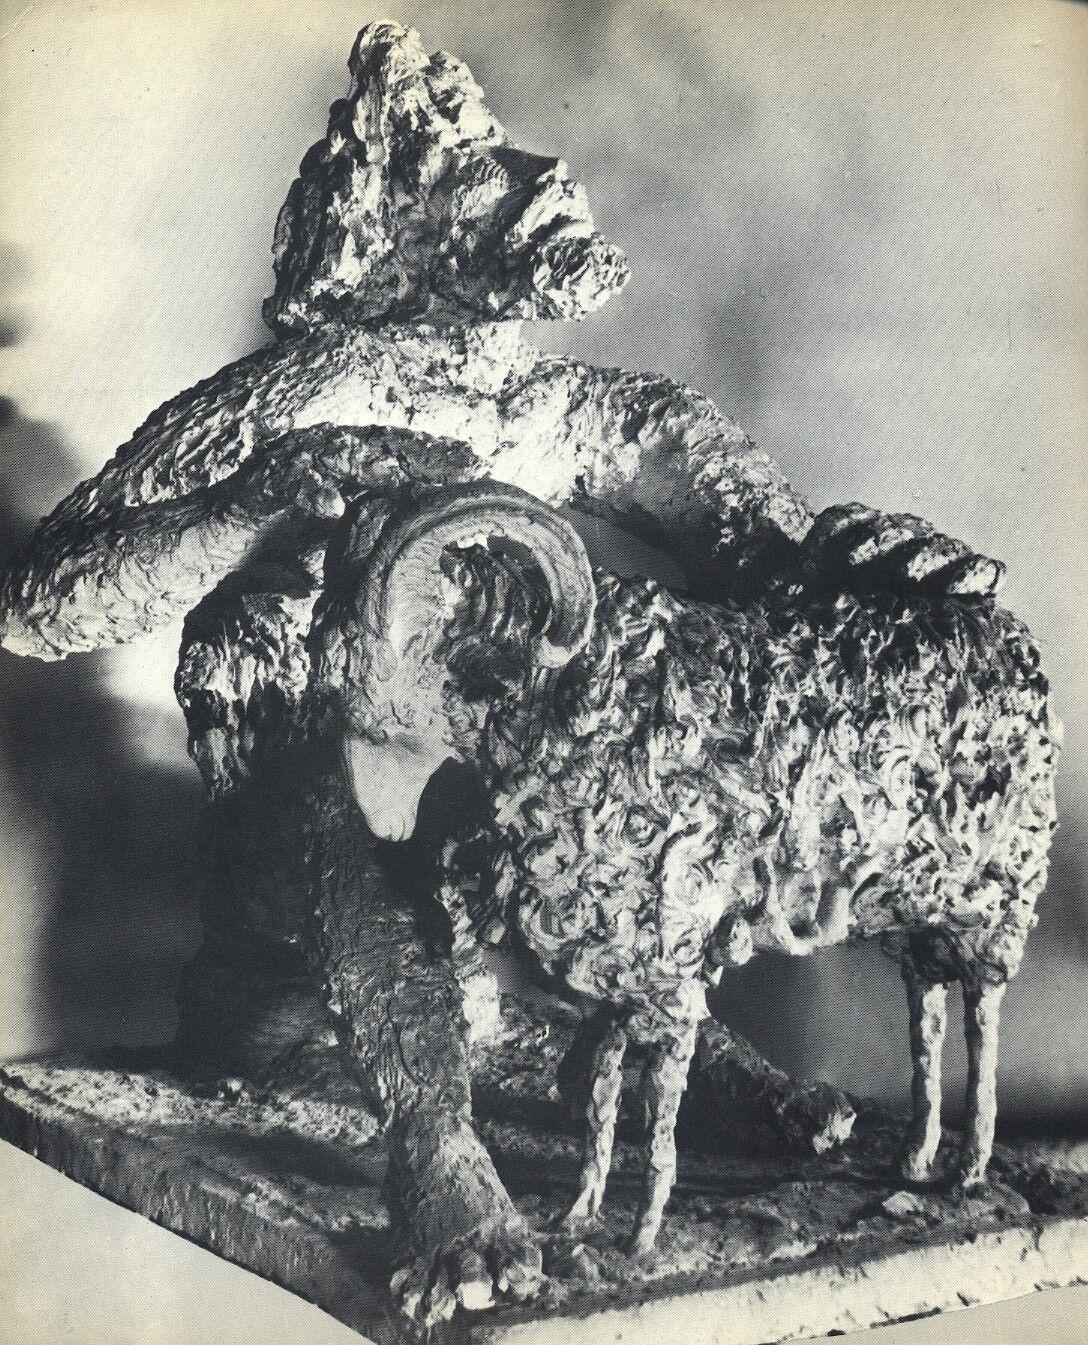 Apeles Fenosa, Polifemo (bronce), 1949.